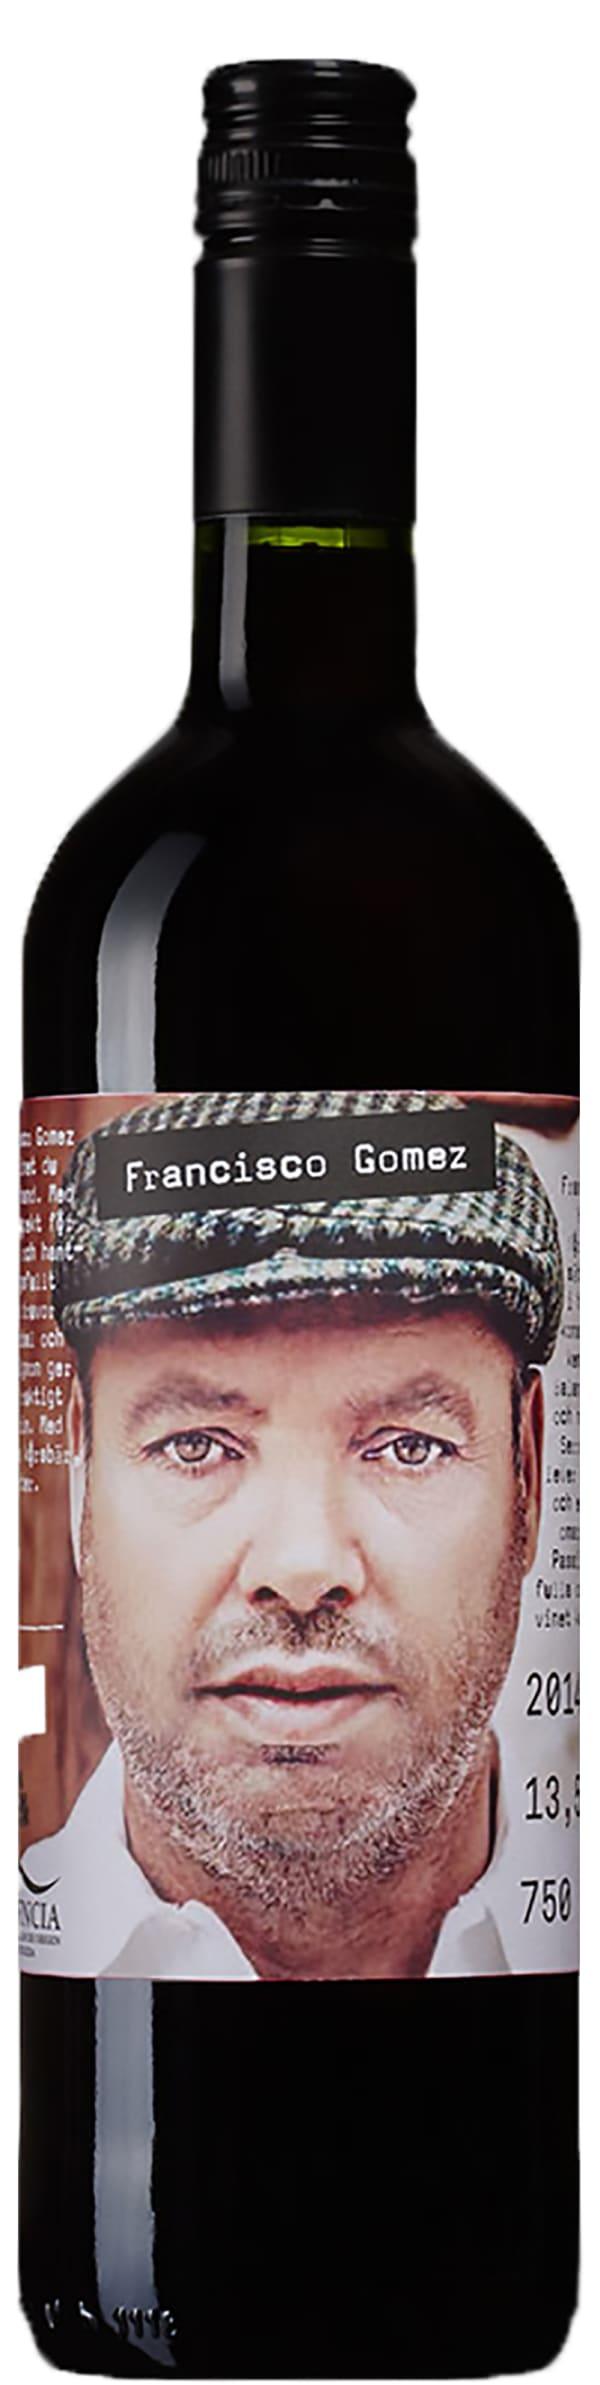 Francisco Gomez Eko Red 2015